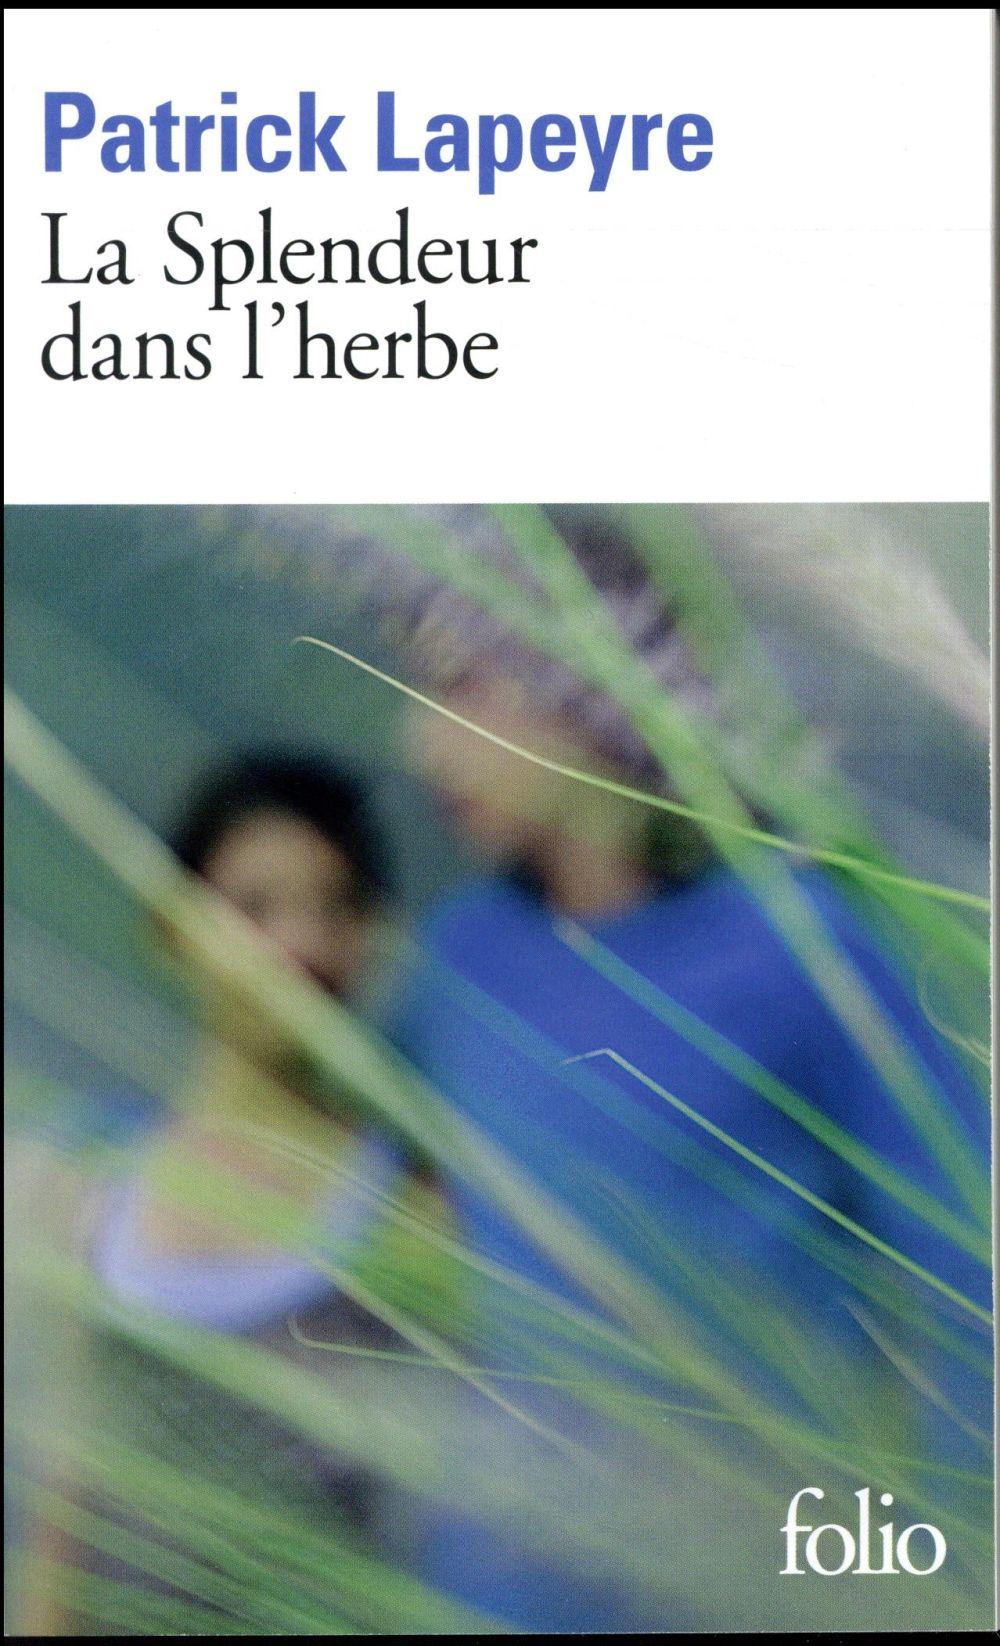 LA SPLENDEUR DANS L'HERBE